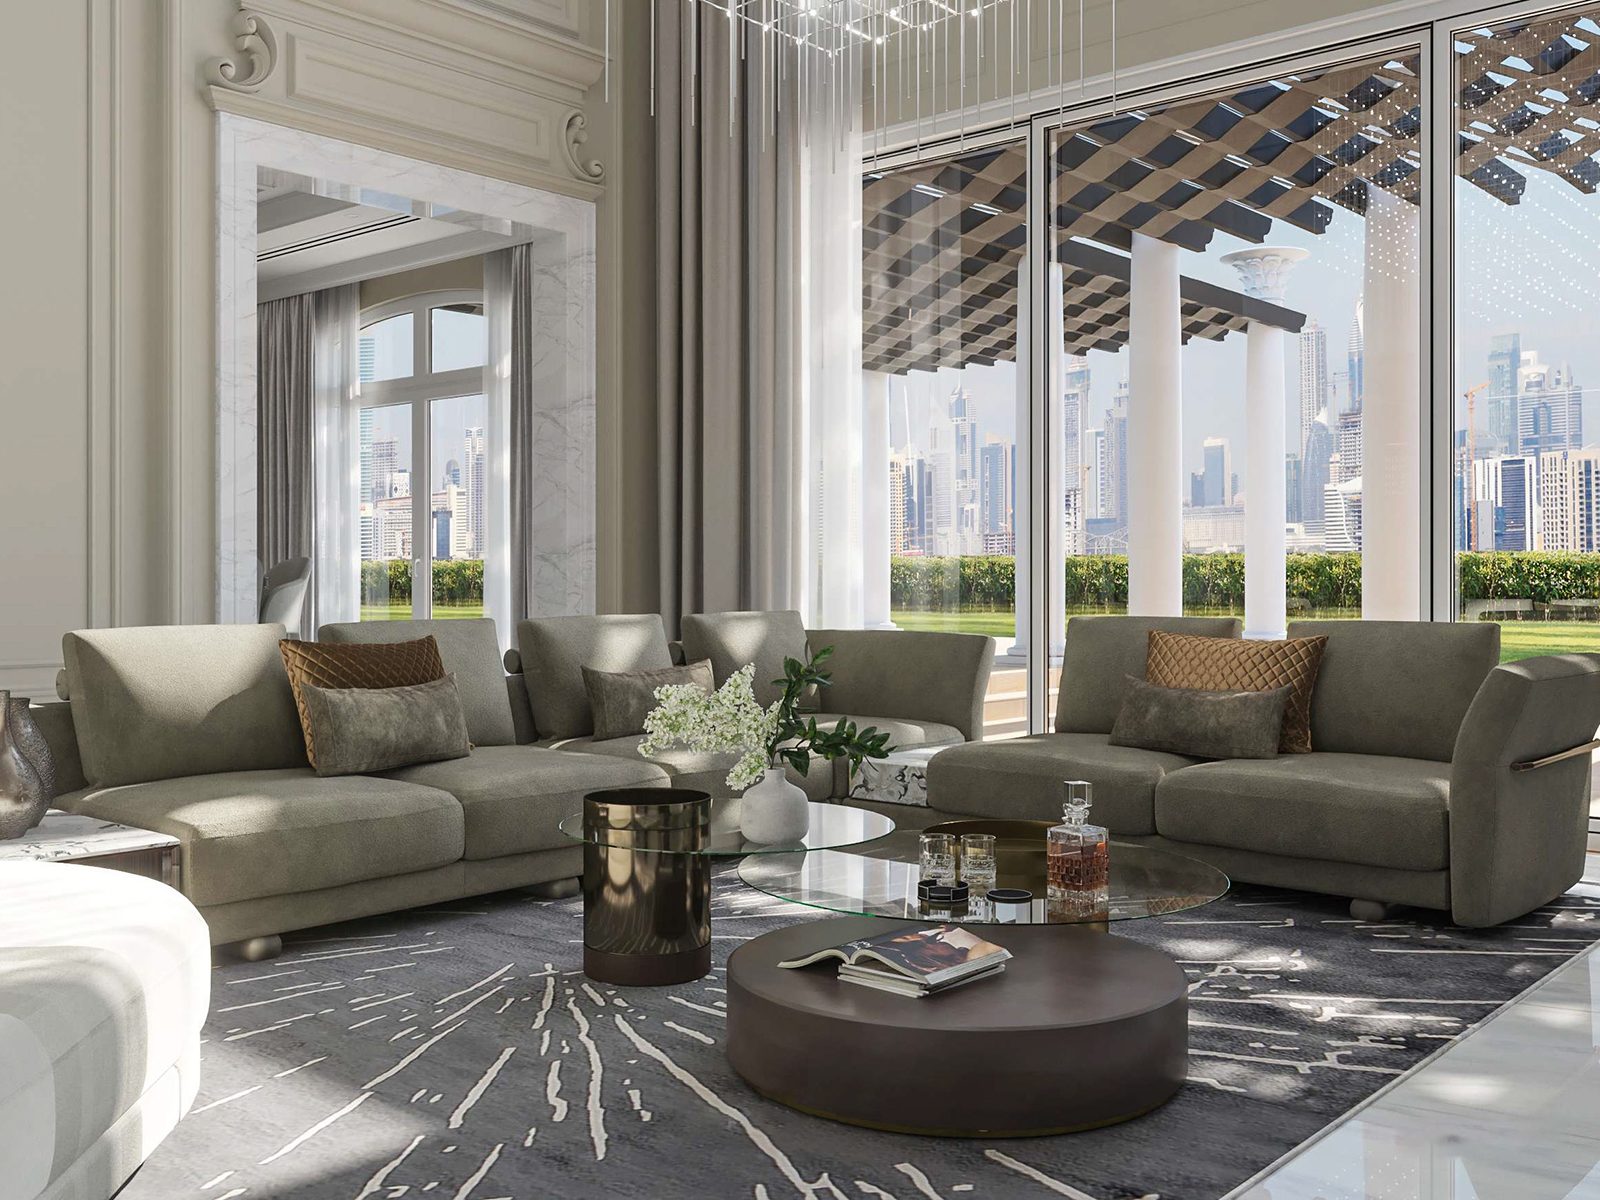 A luxurious living room with view of Dubai city skyline